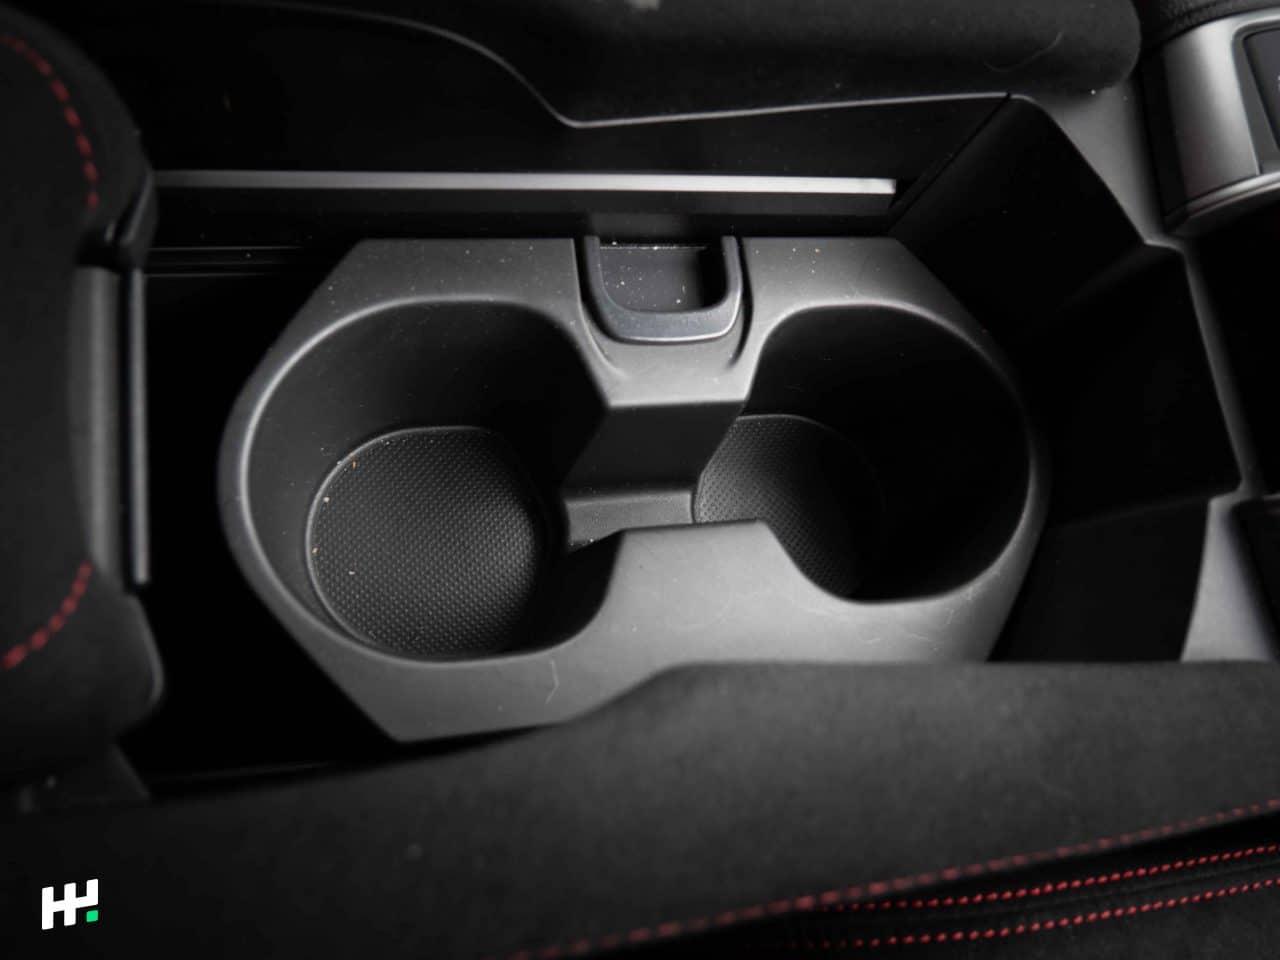 Porte gobelets de la Civic Type R FK8